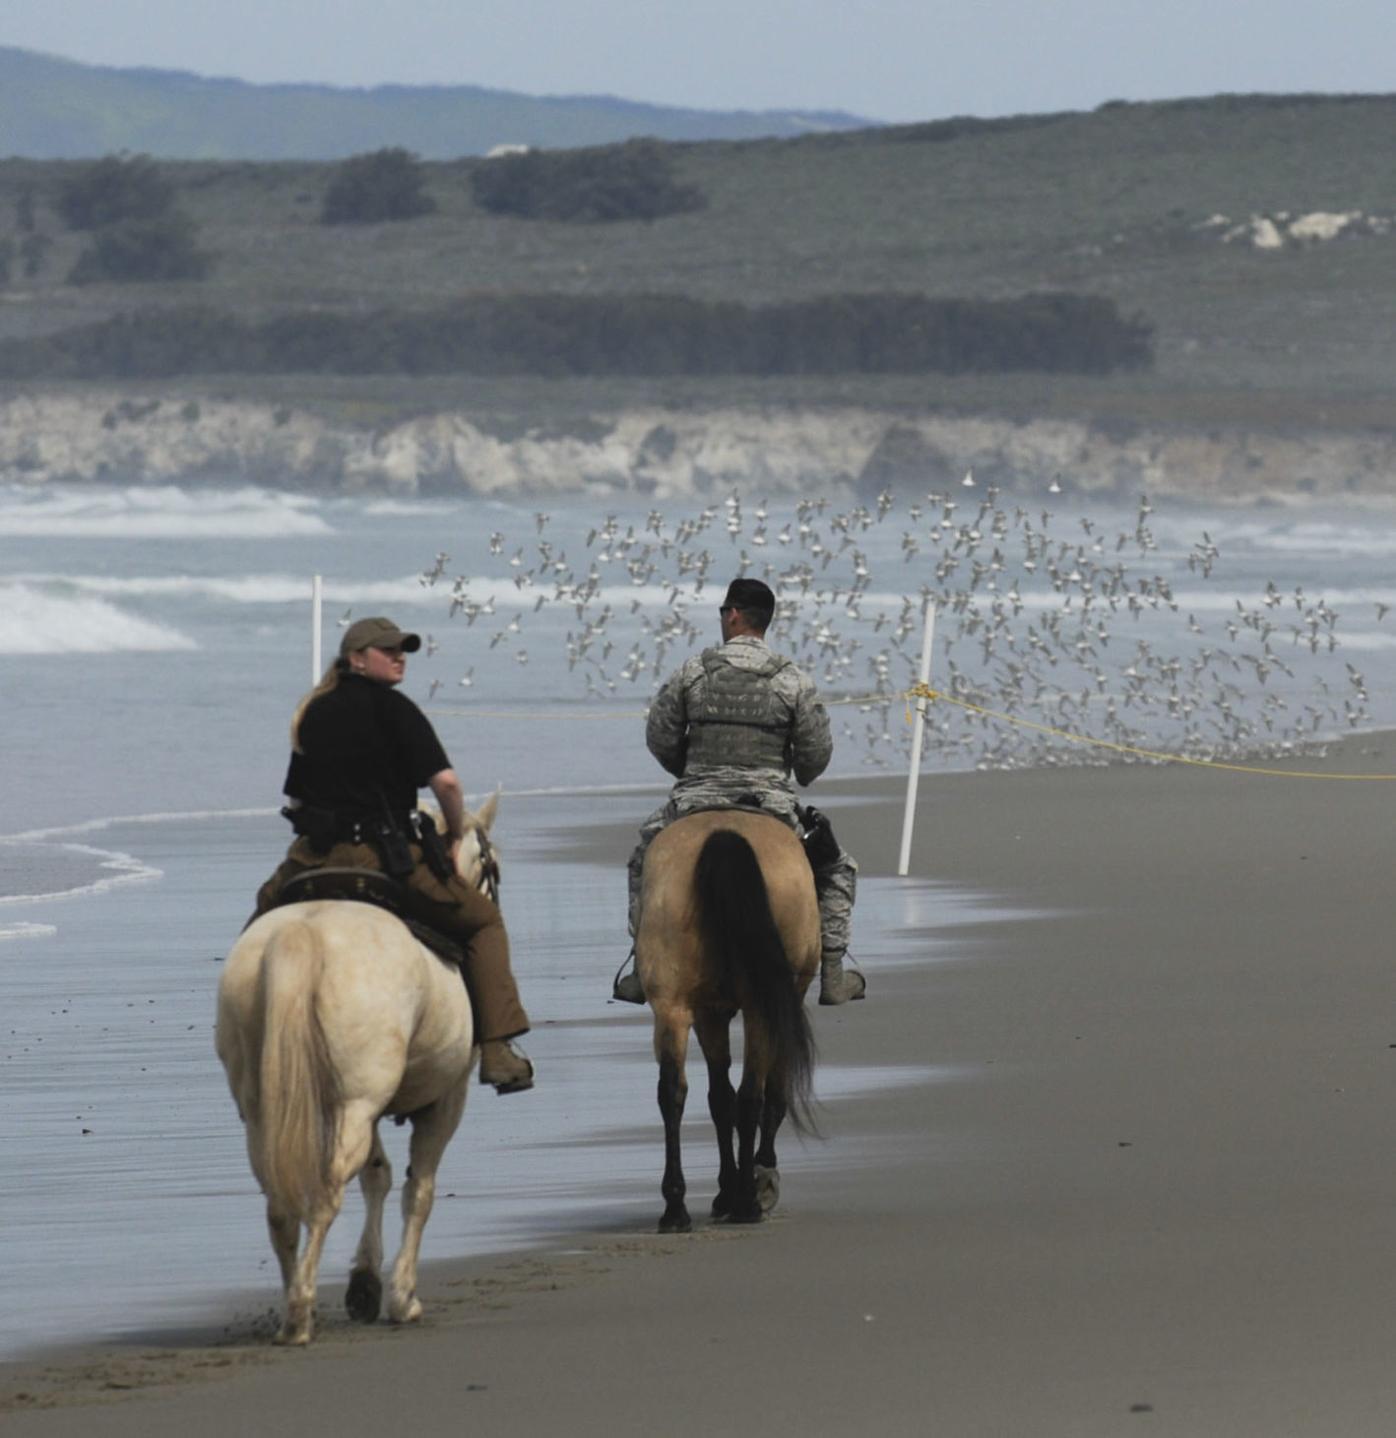 031919 VAFB horse patrol 02.jpg